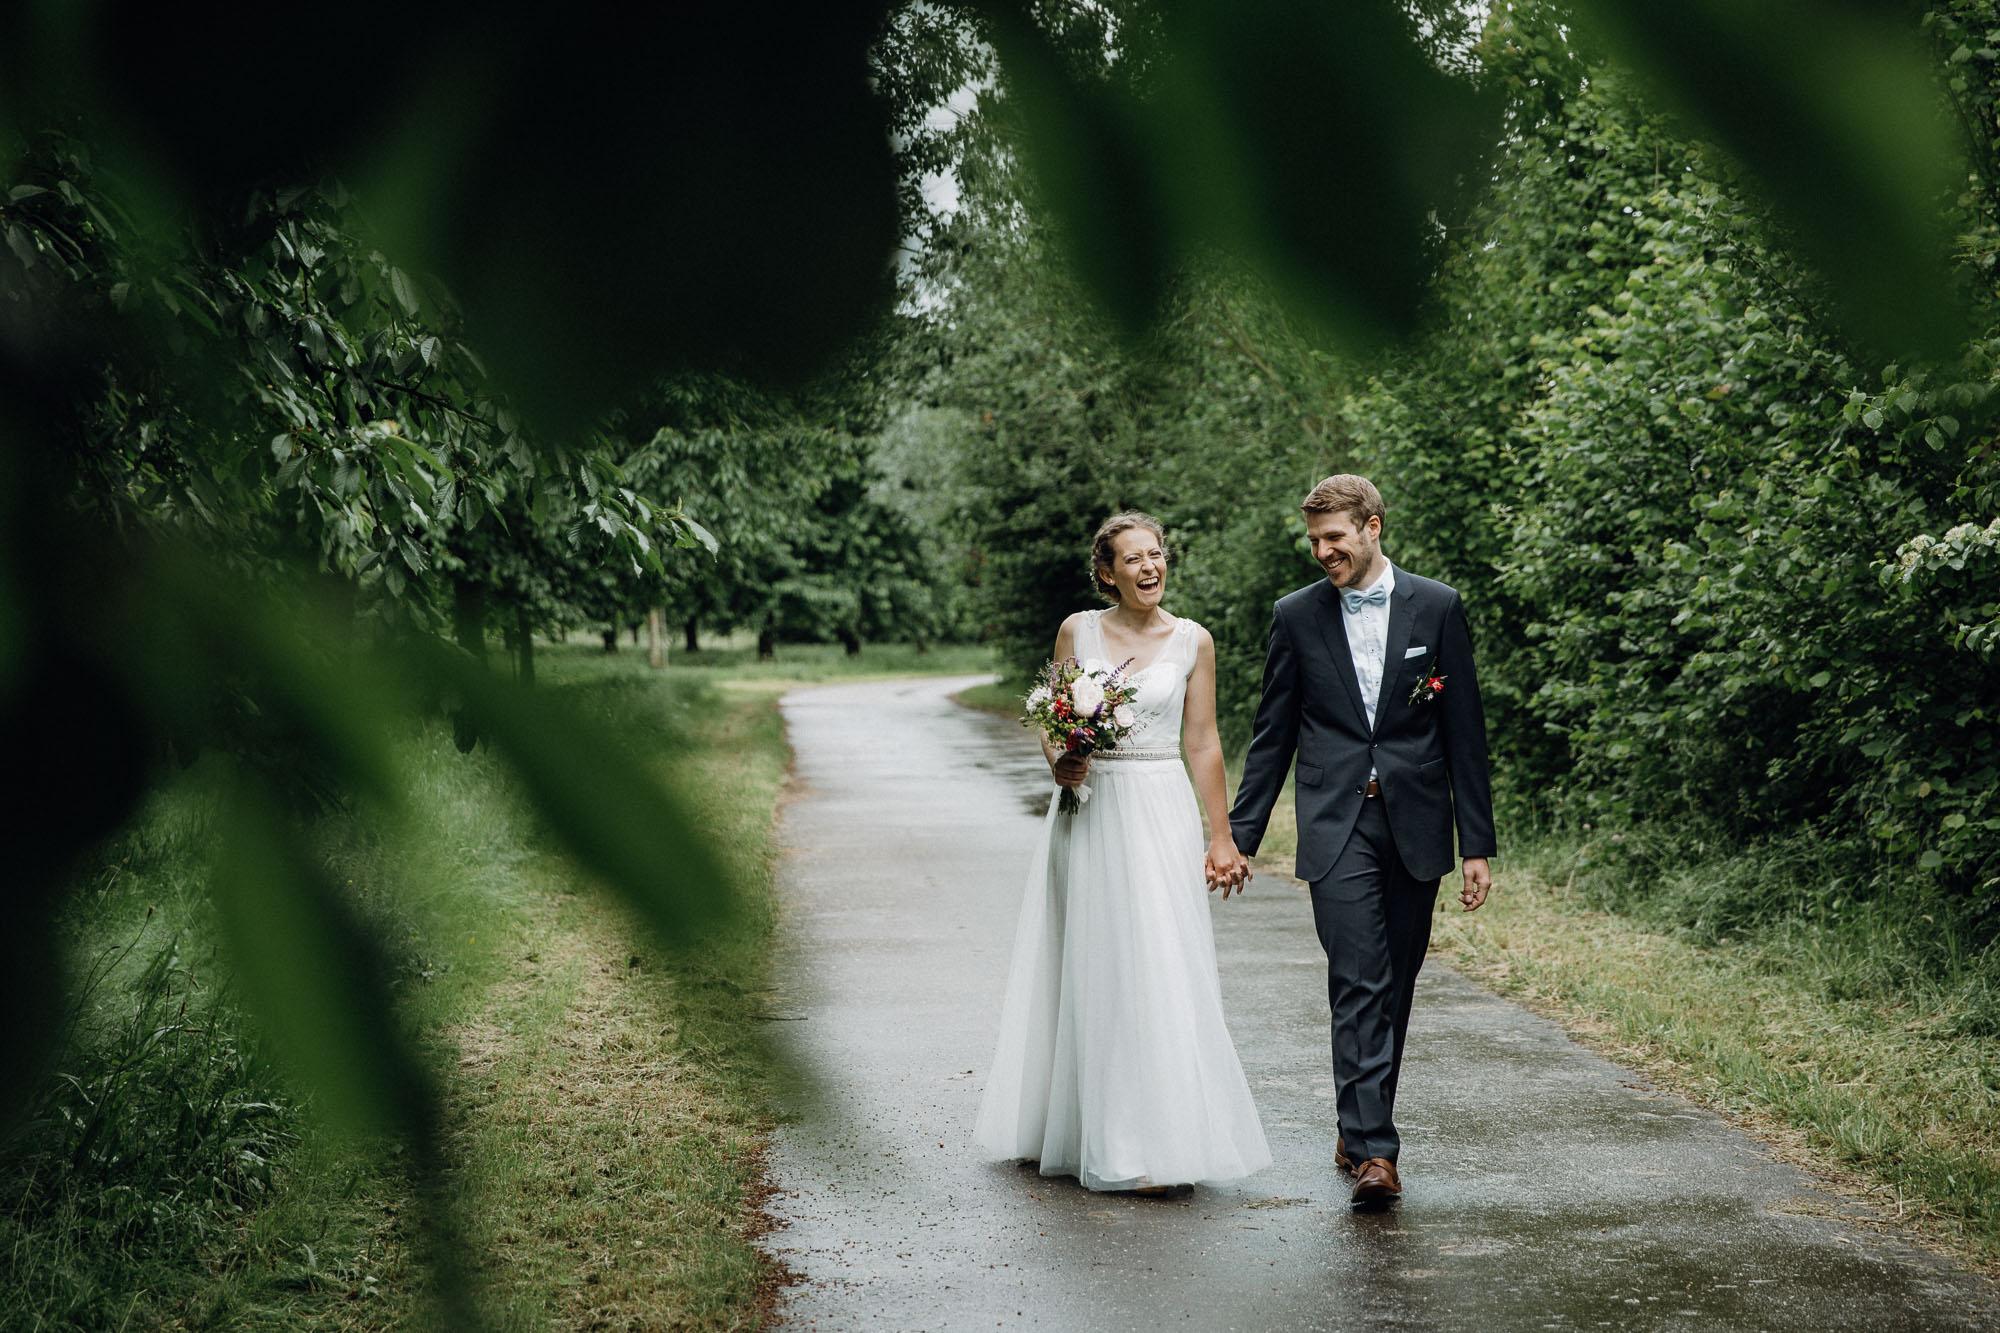 raissa simon photography destination wedding munich black forest offenburg 029 - Claudia + Christoph